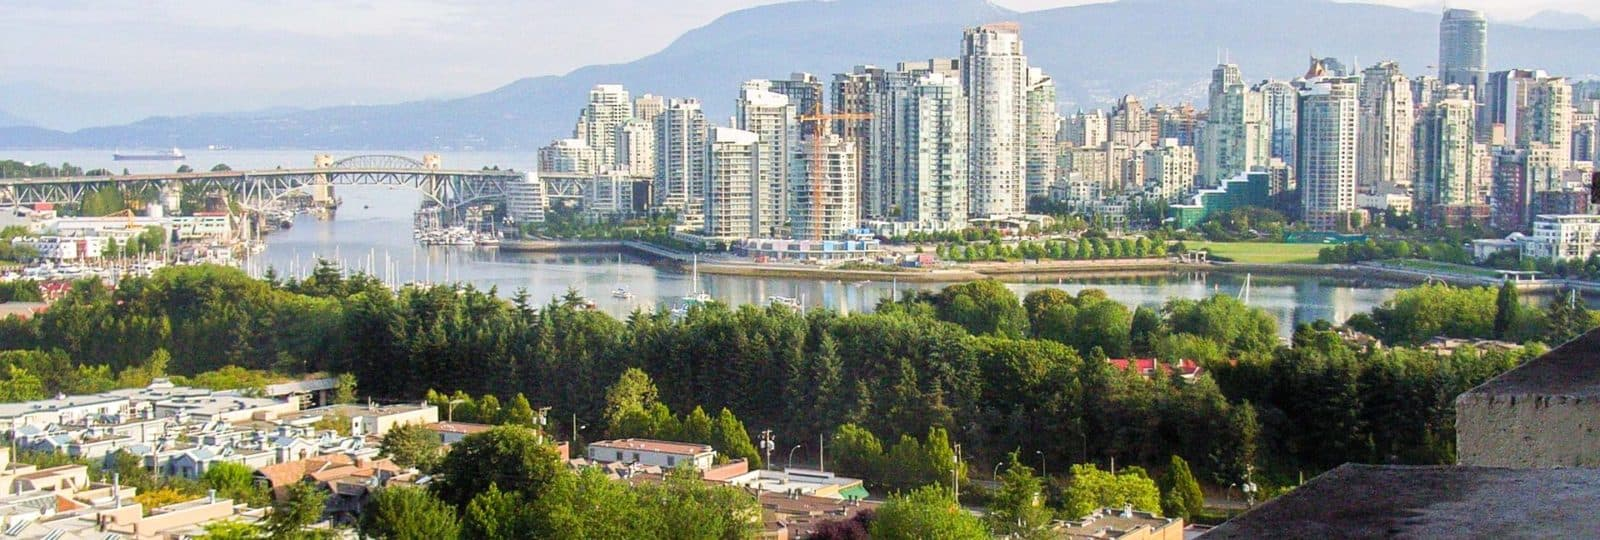 Vancouver City Tour – individuell, persönlich mit Markus